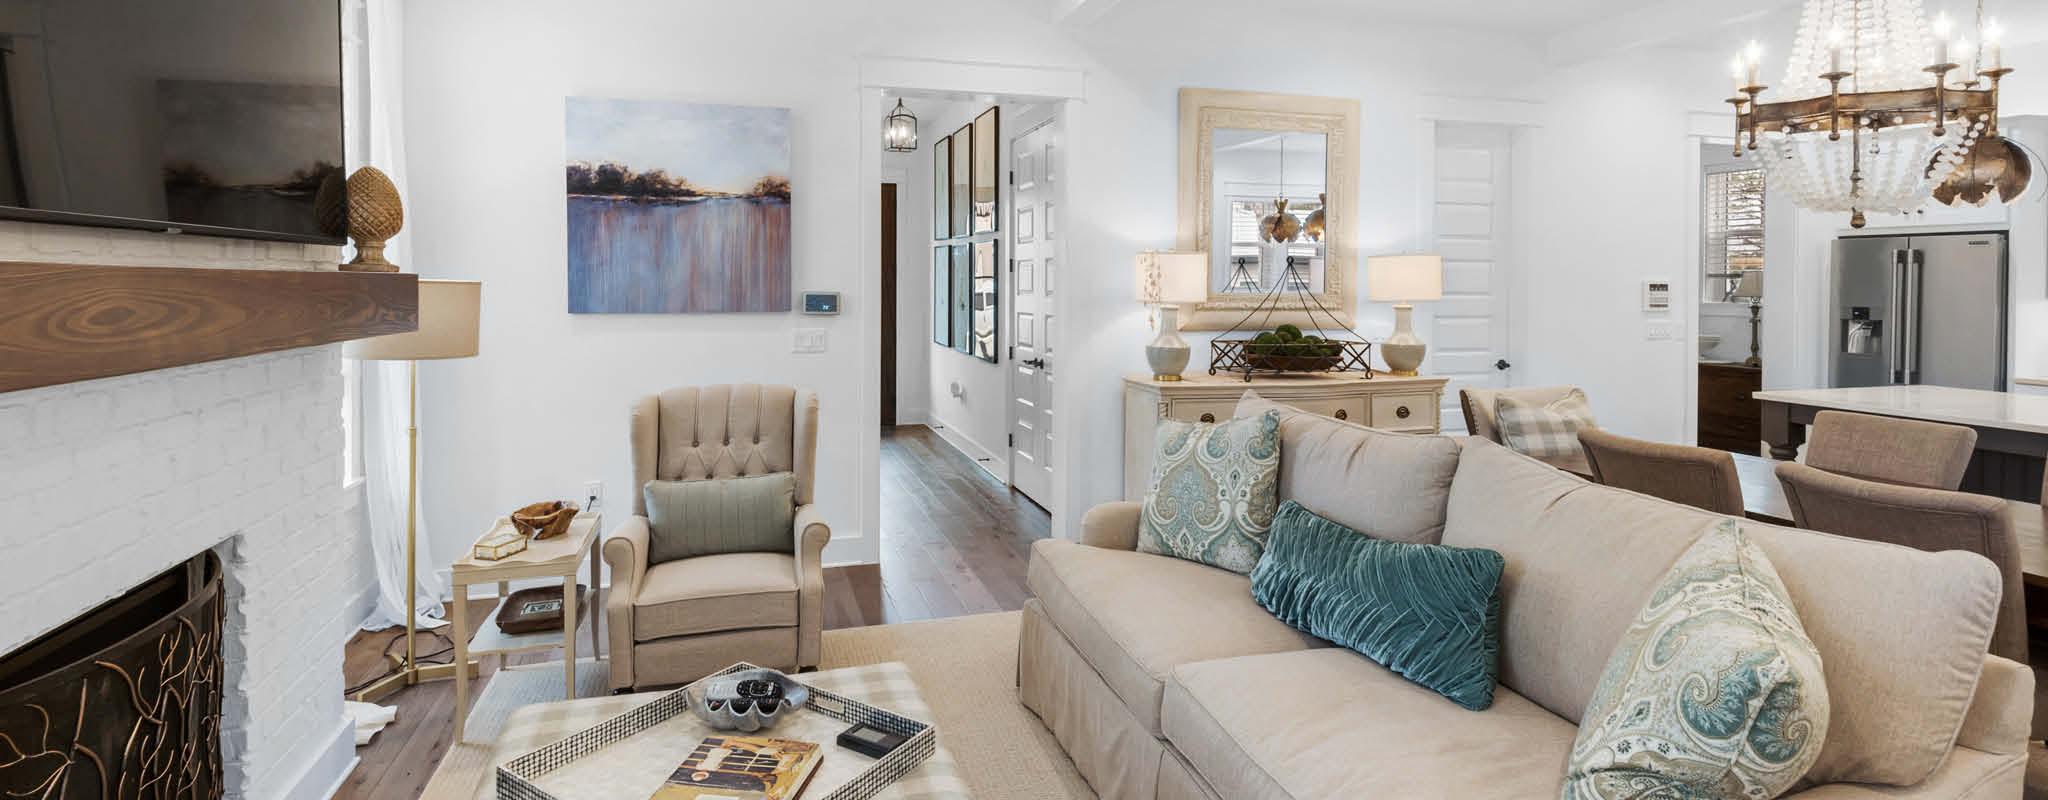 RidgeWalk Living Area in Santa Rosa Beach